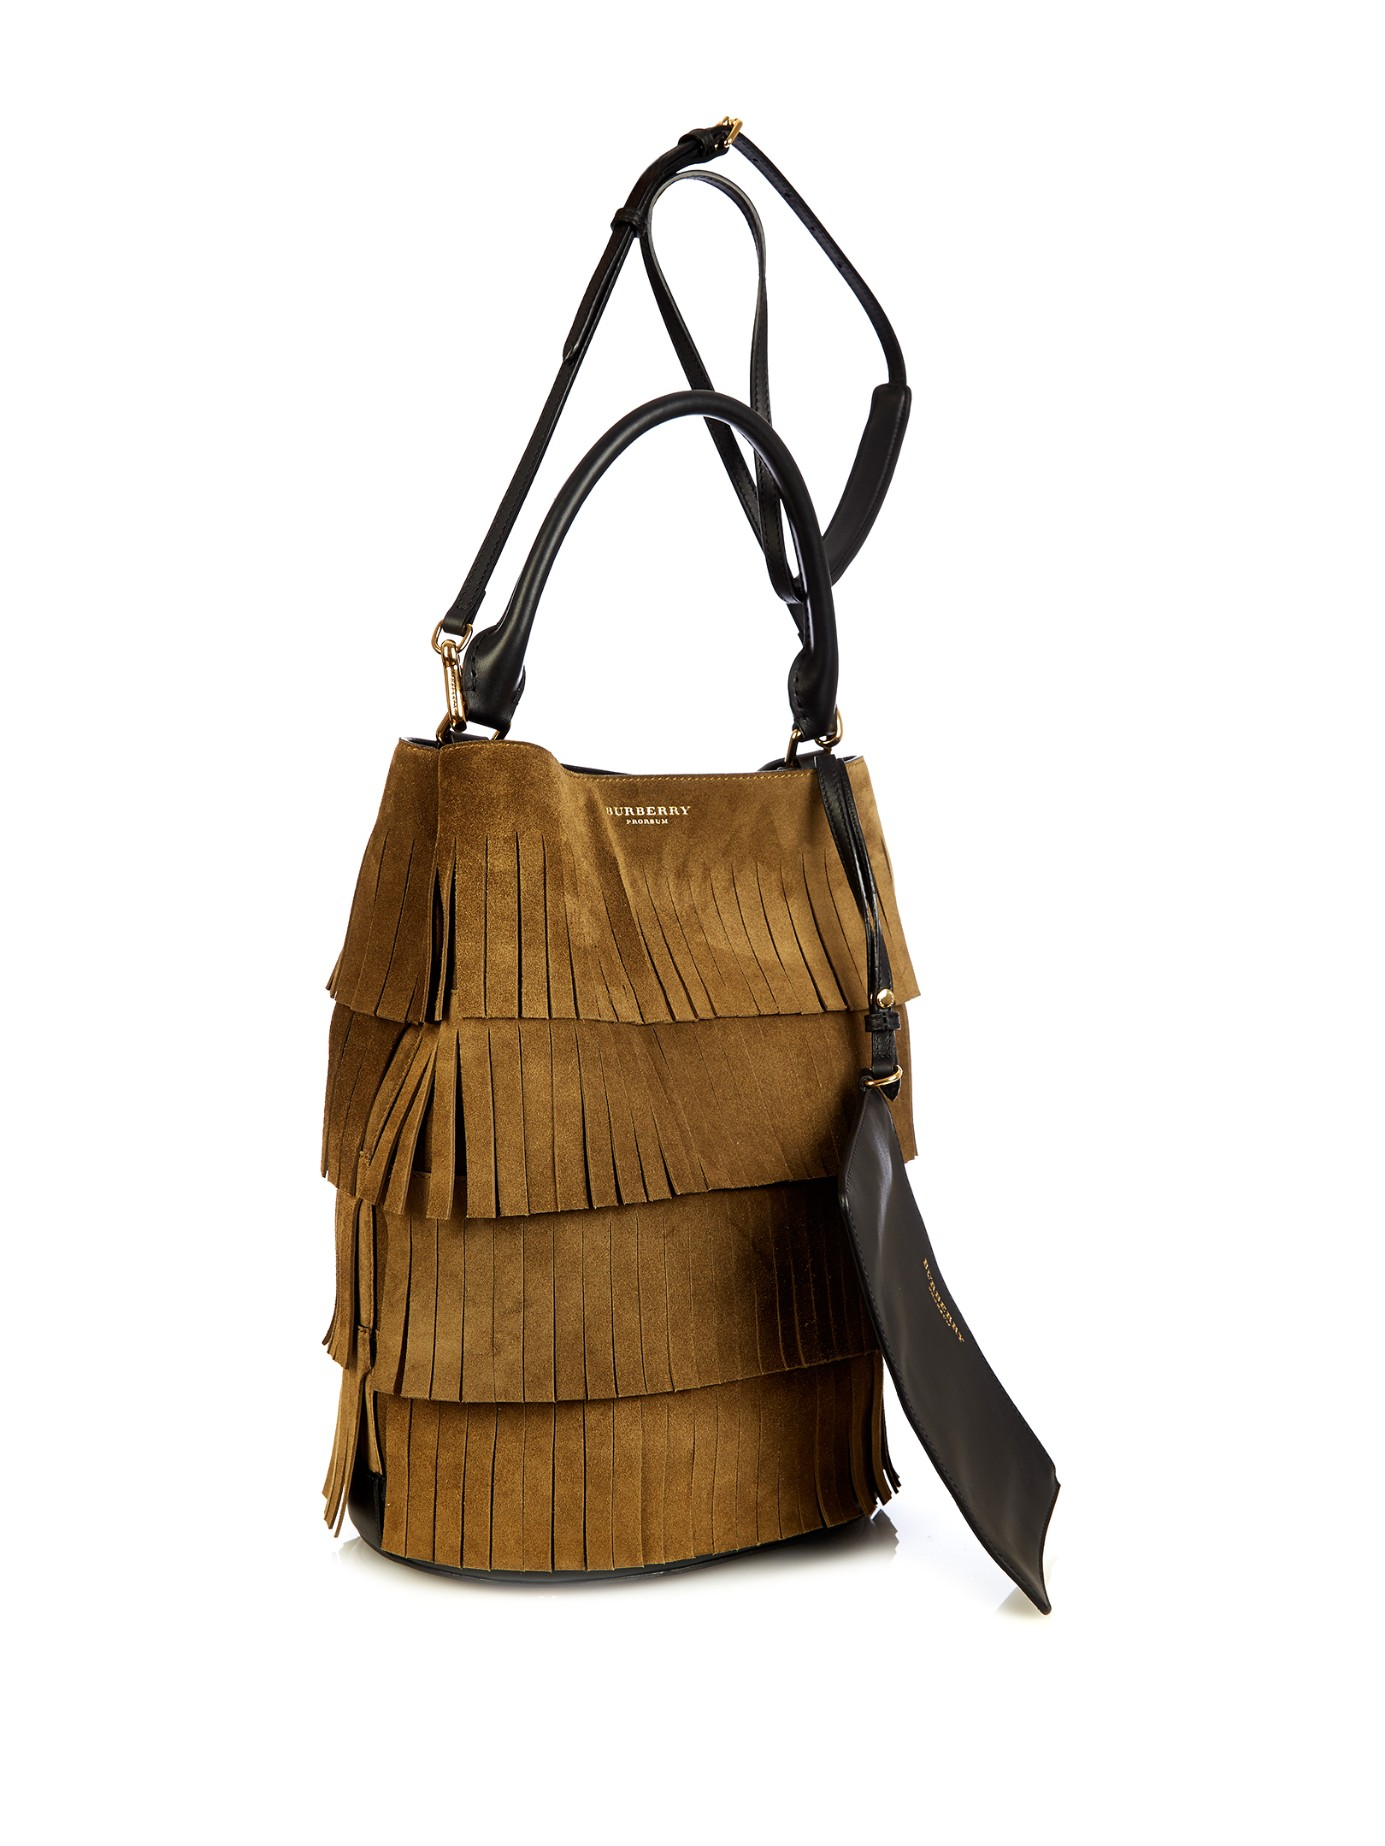 Lyst - Burberry Prorsum Camo-print Calf-hair Bucket Bag in Natural 56a1e3485471b